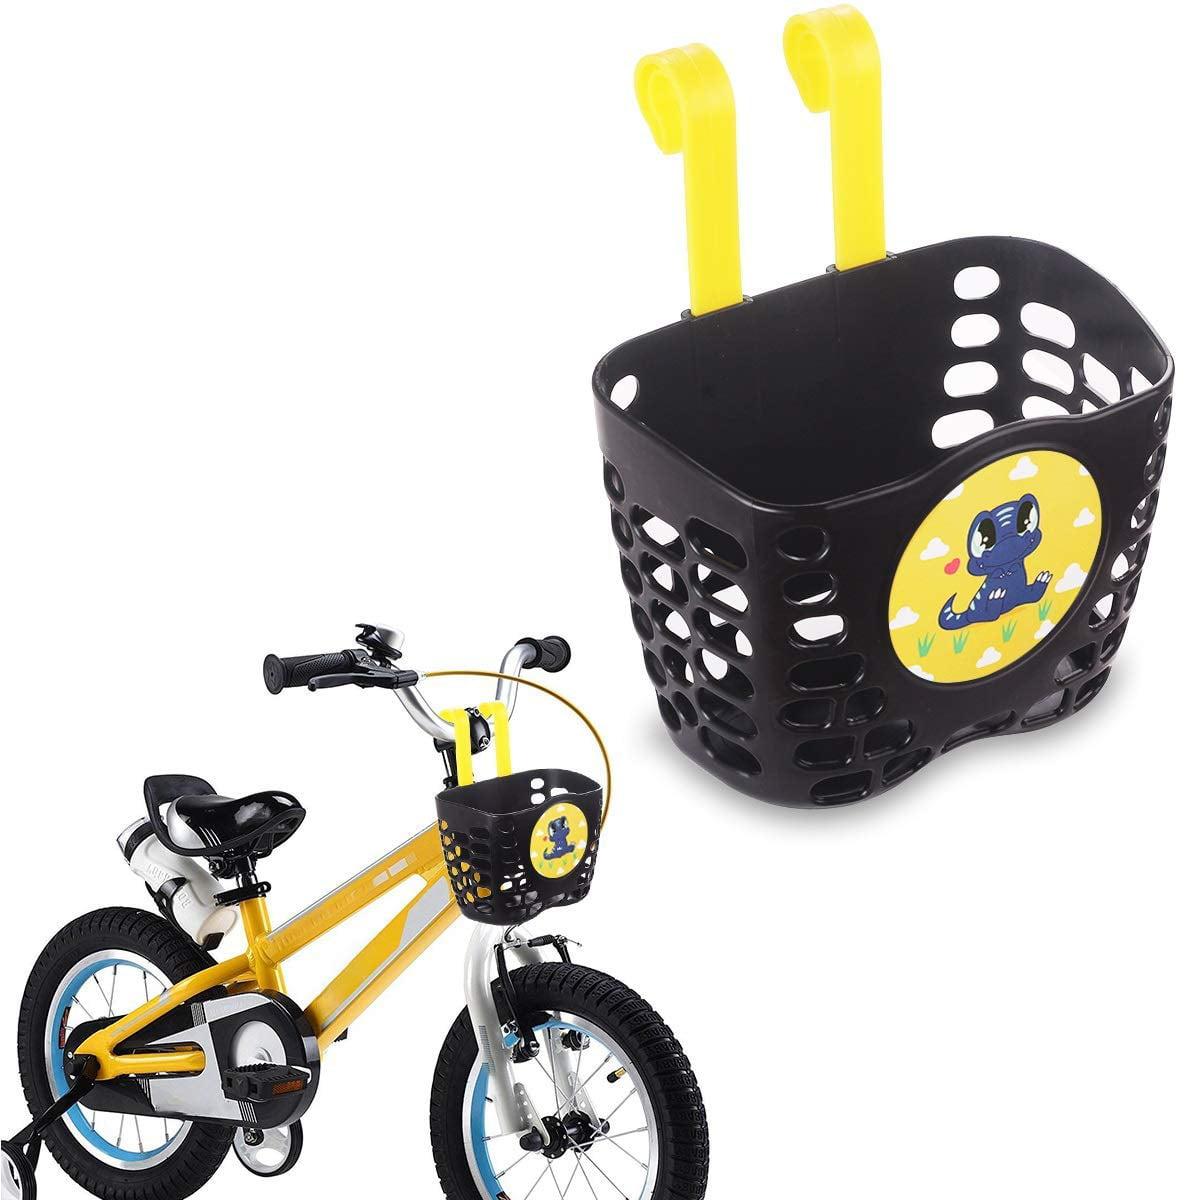 Black Toyandona Kids Bike Basket Dinosaur Pattern Plastic Front Handlebar Bicycle Basket Scooter Basket For Kids Boys Girls Sports Outdoors Cycling